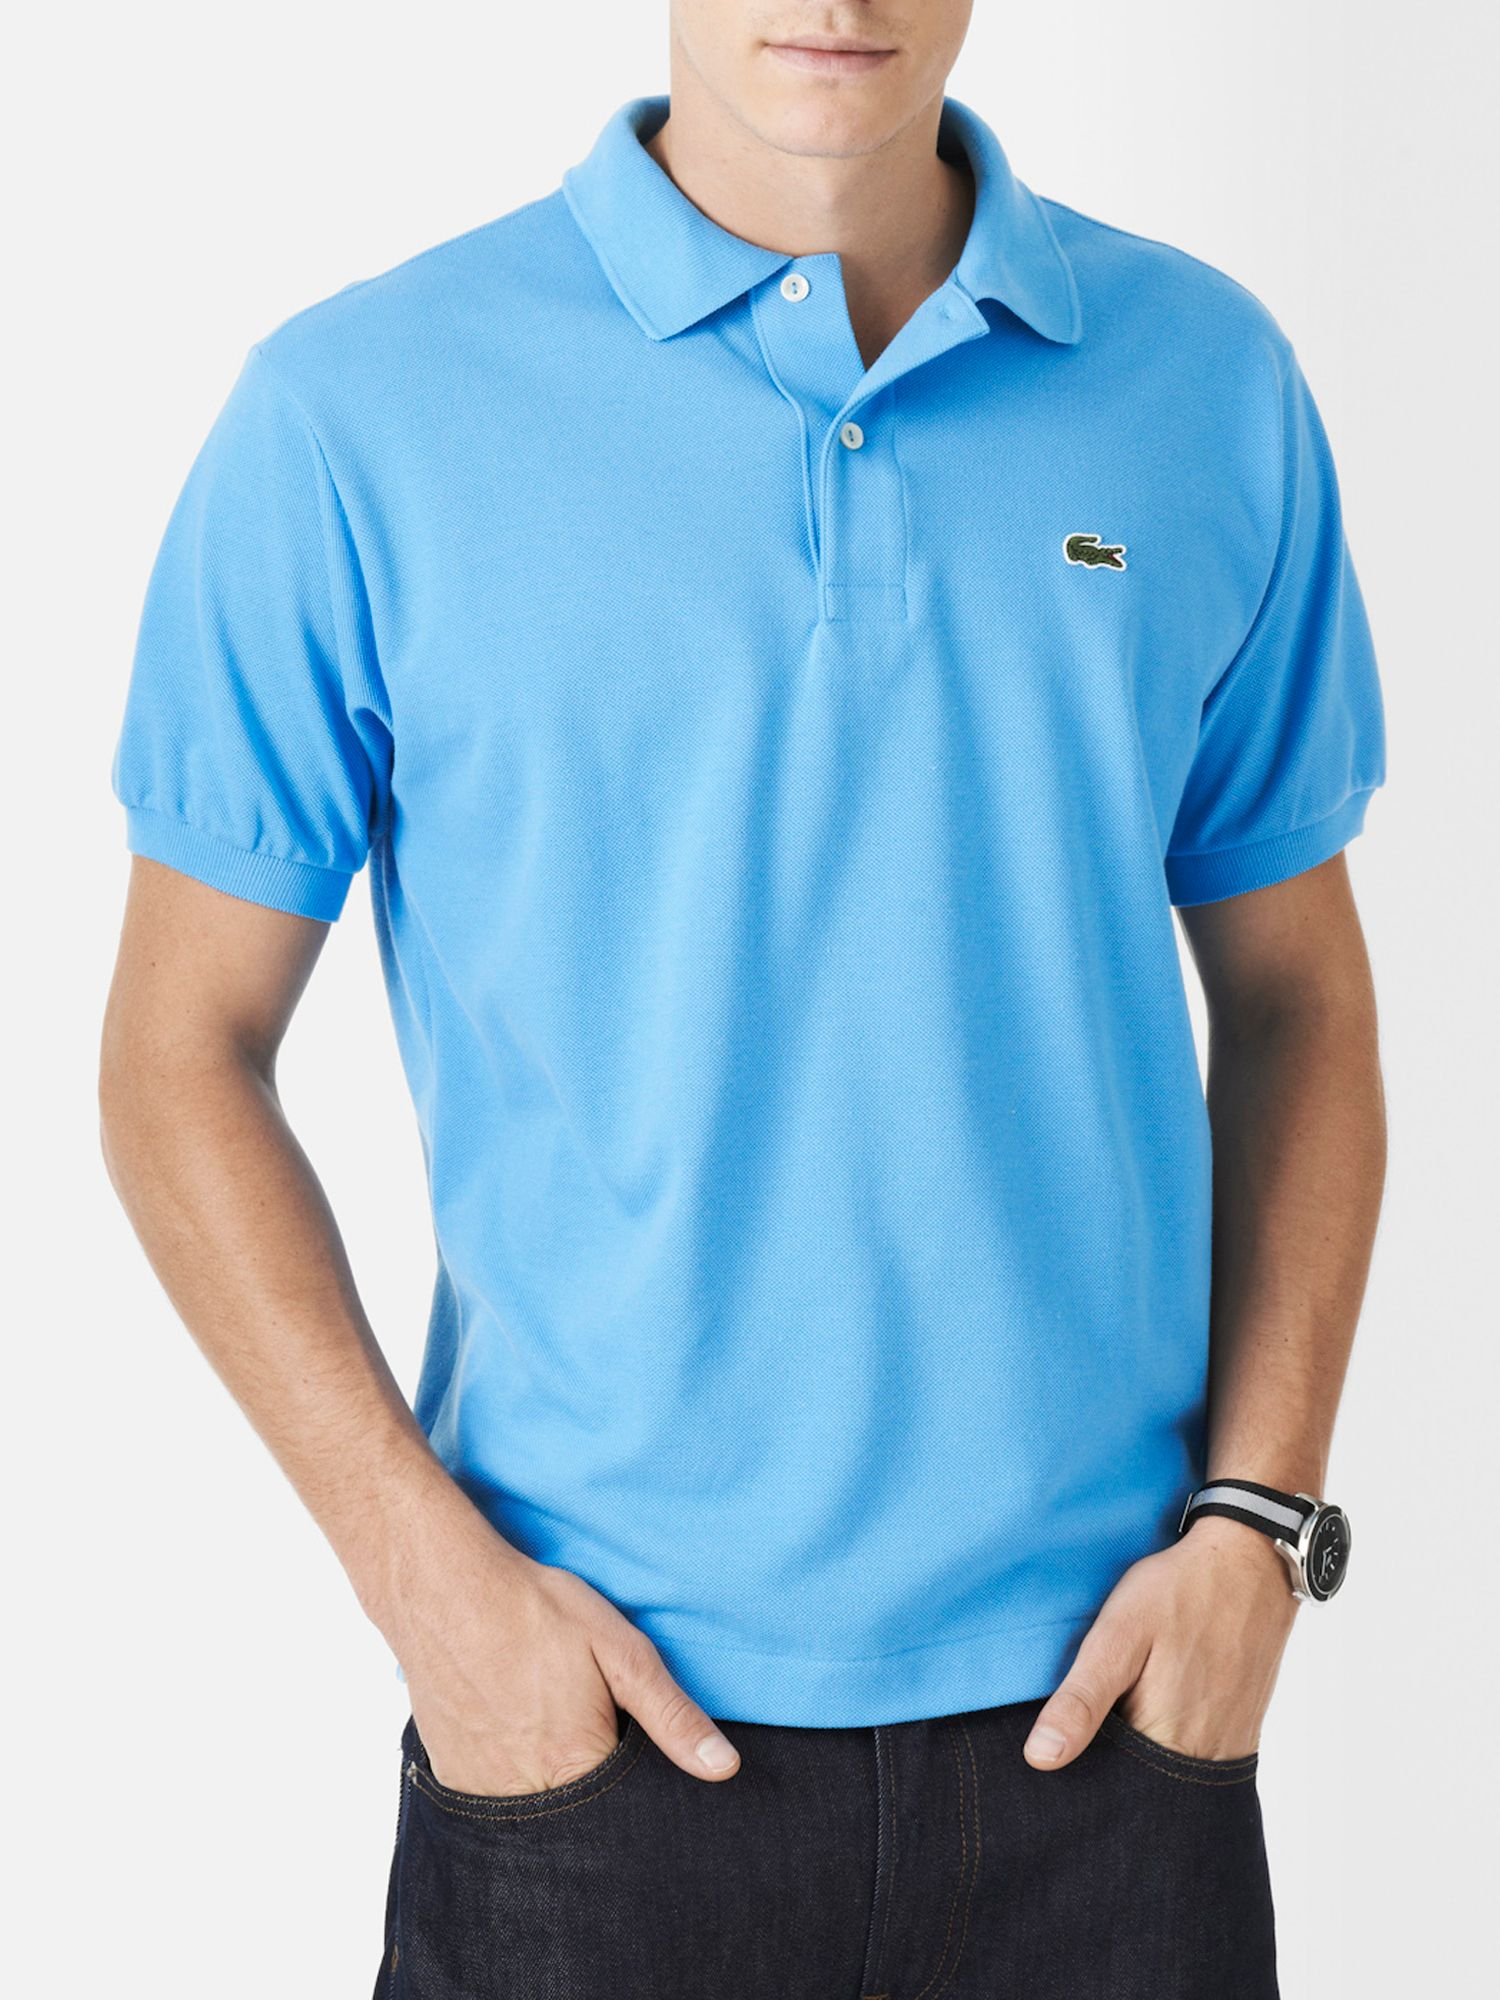 8a58766e734d Light Blue Polo Shirt Lacoste